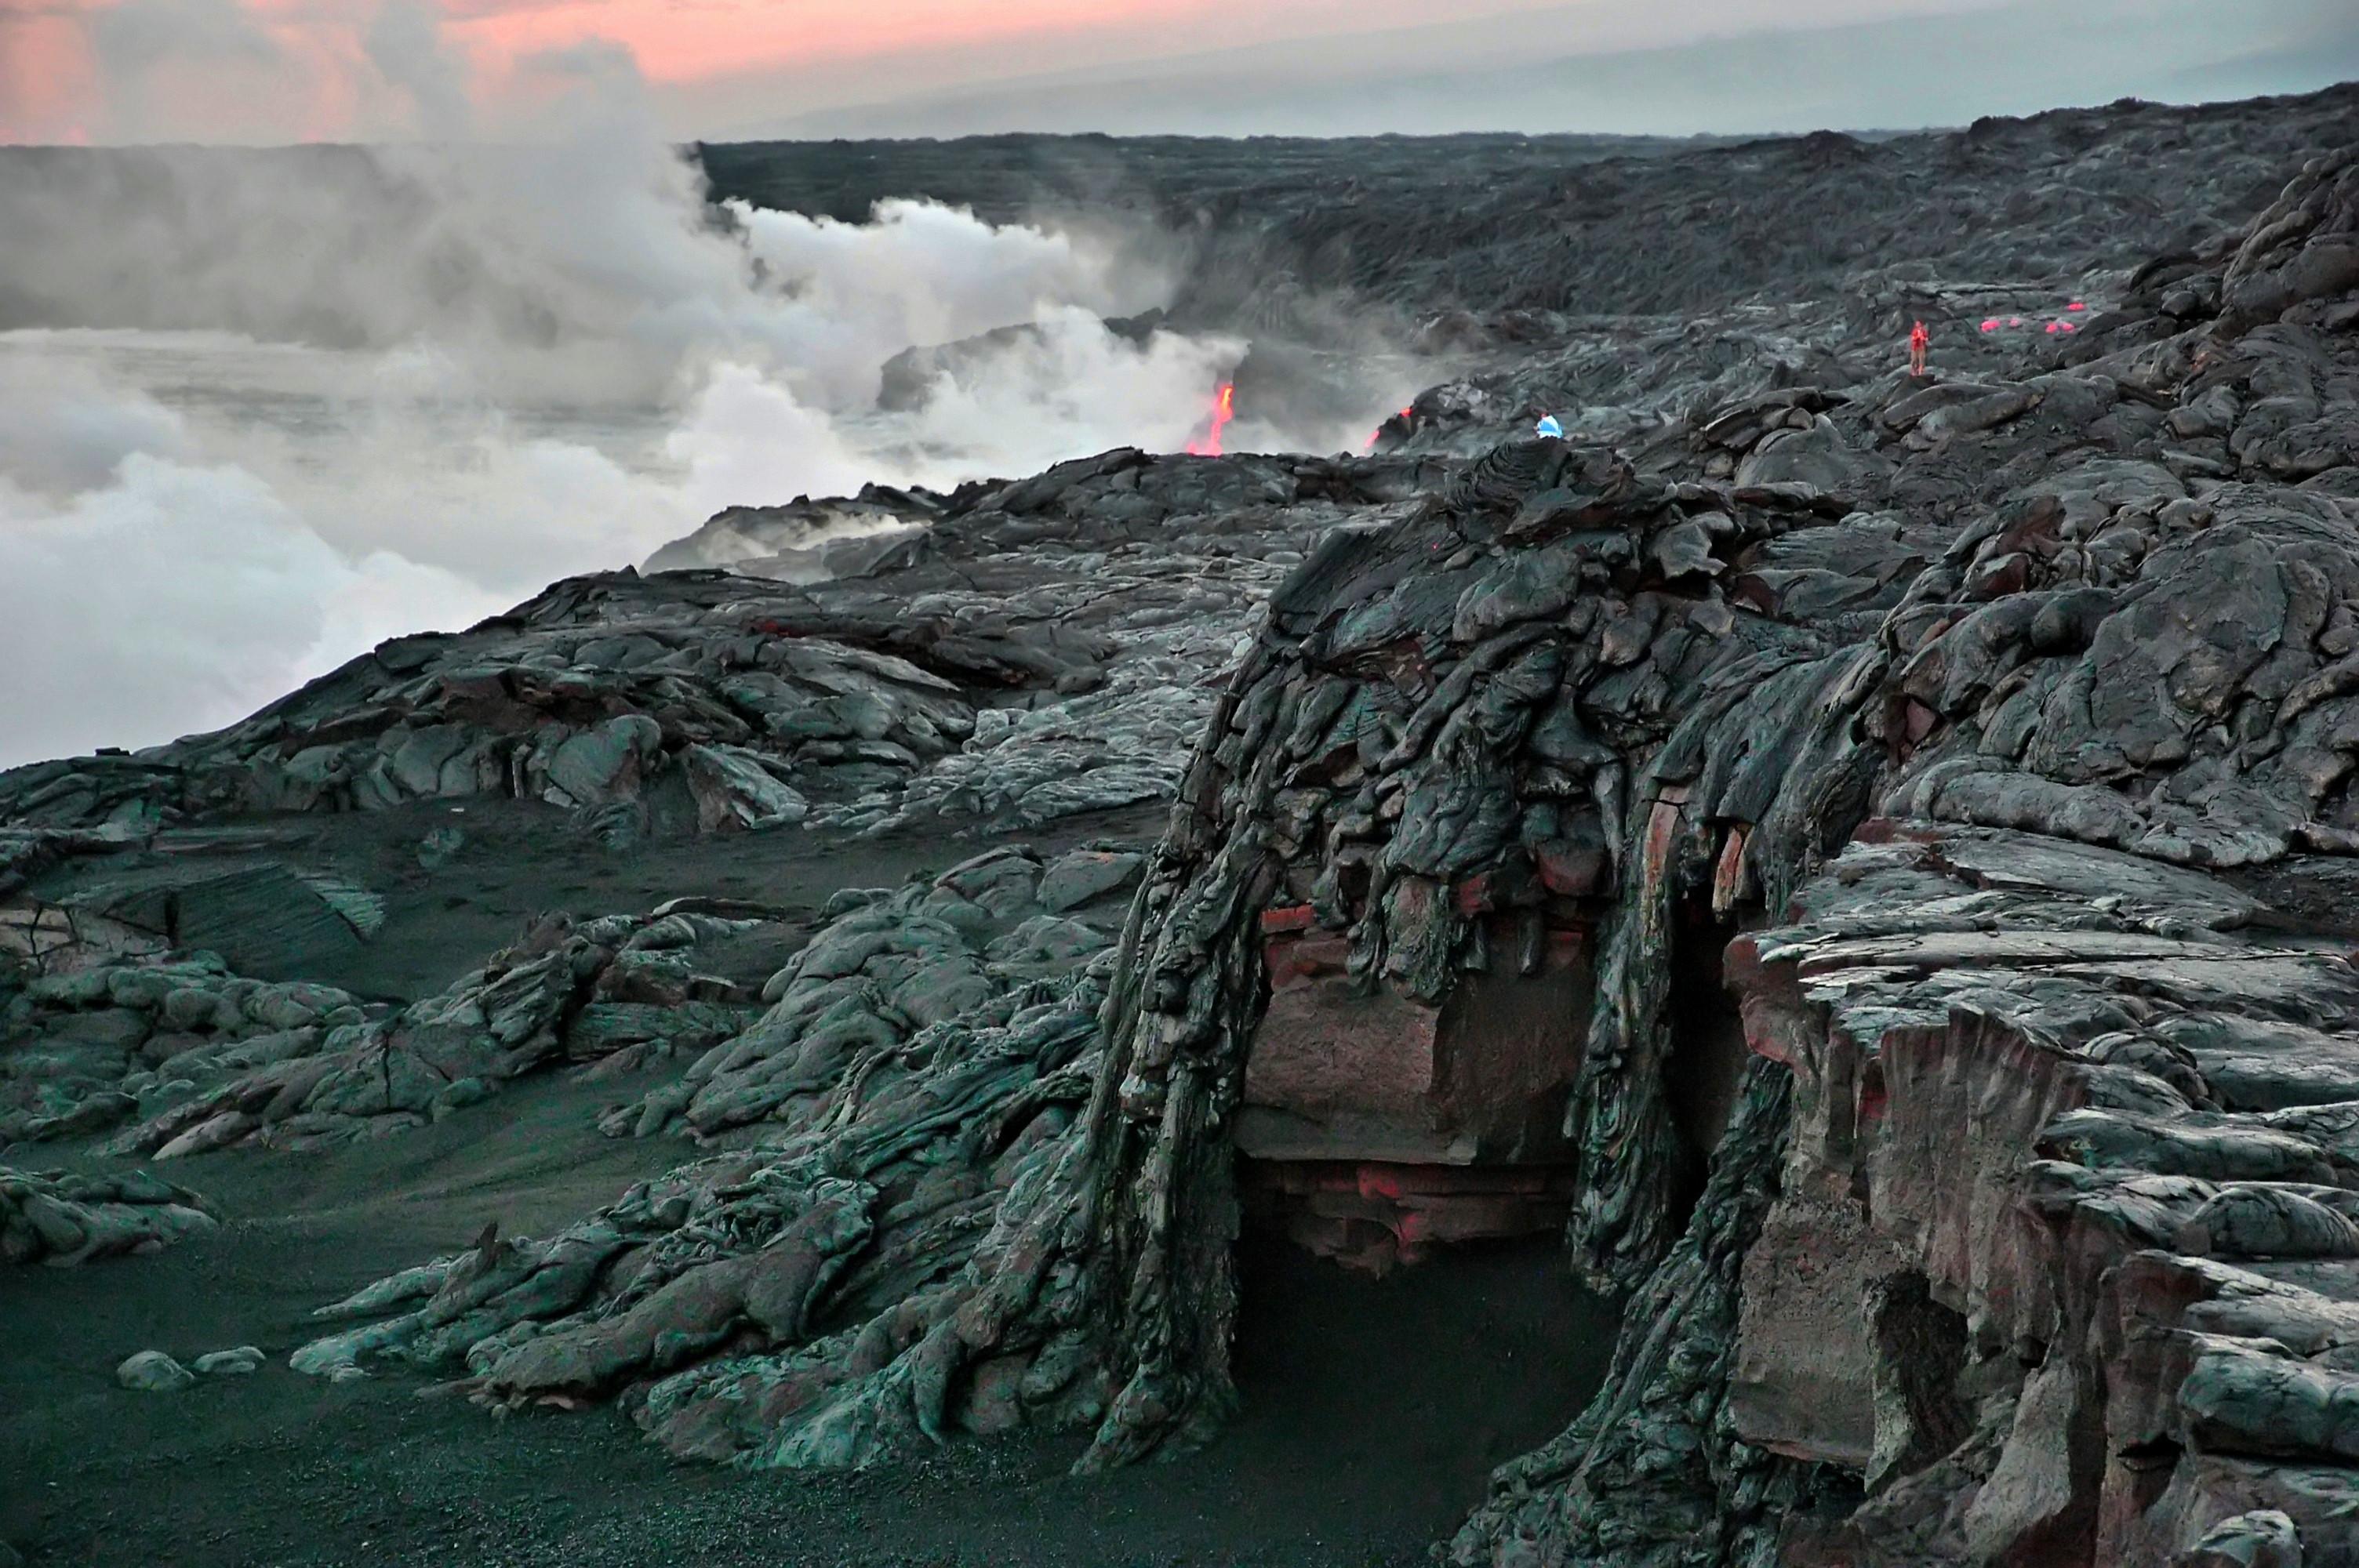 volcanoes national park, hawaii, volcano, steam